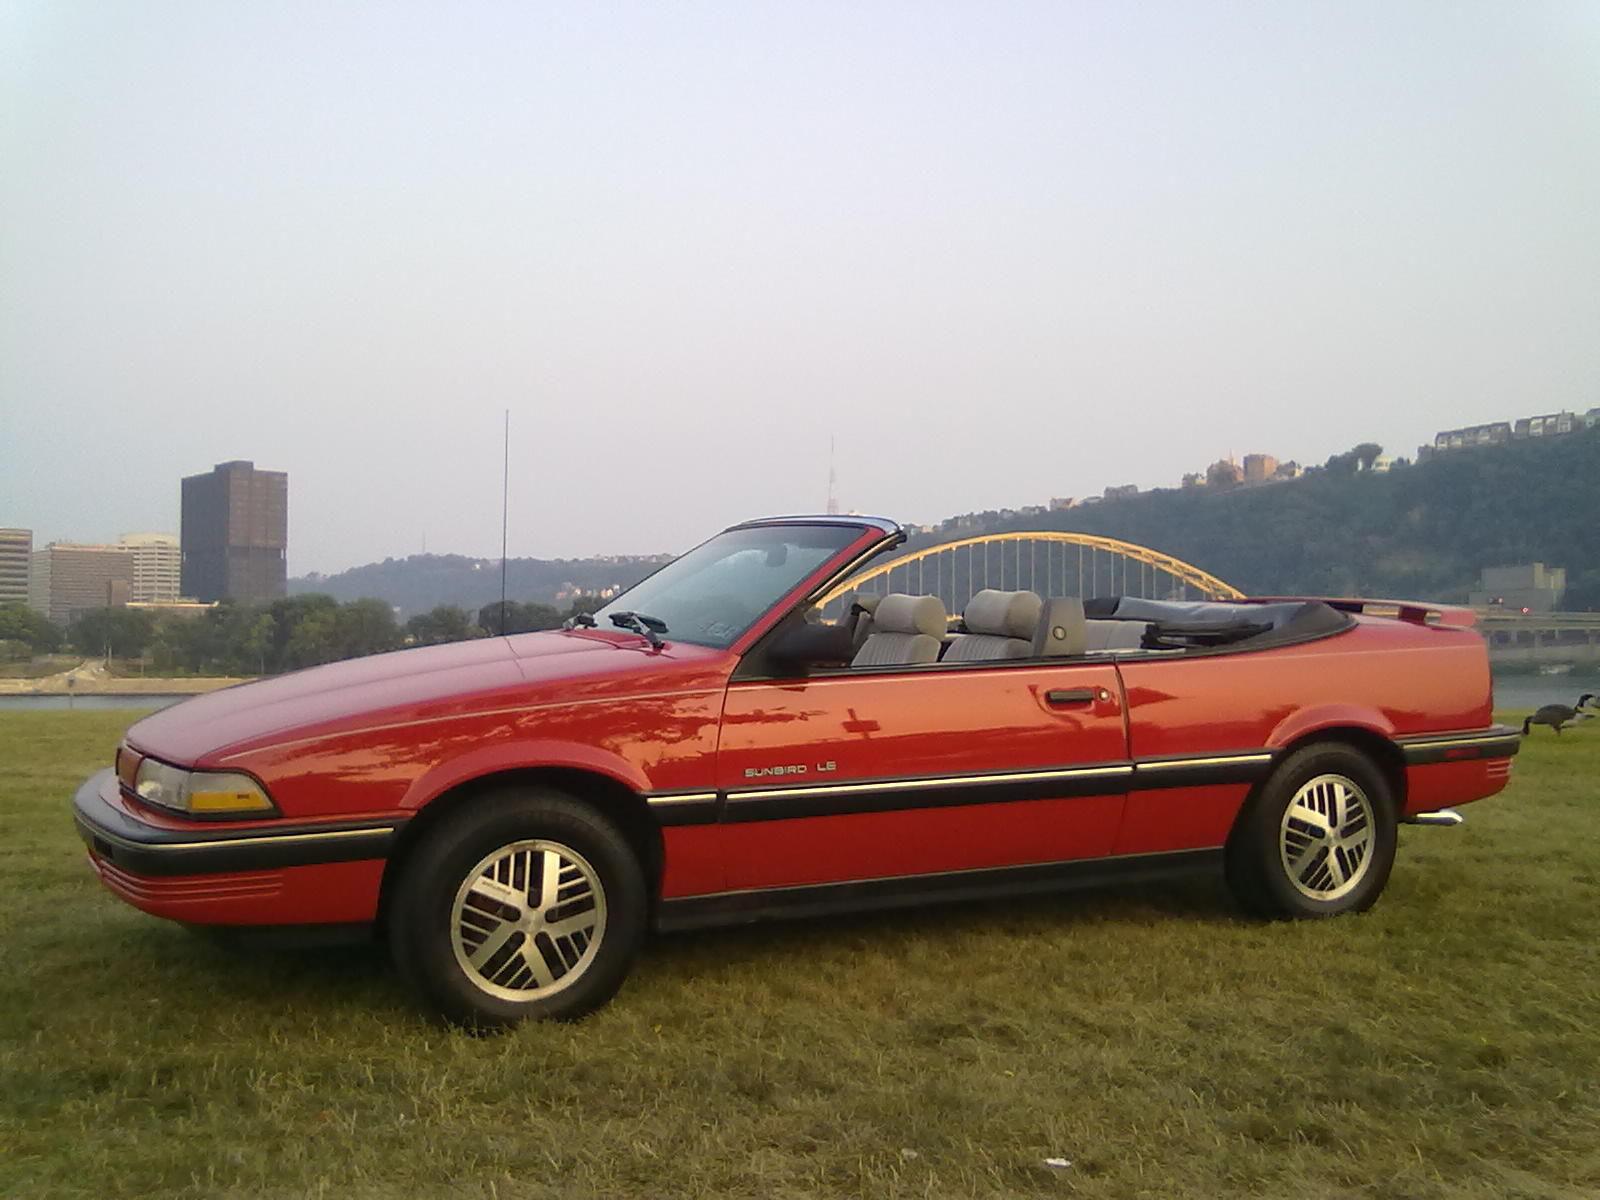 1990 Pontiac Sunbird Le Convertible 2 Door 2 0l Classic